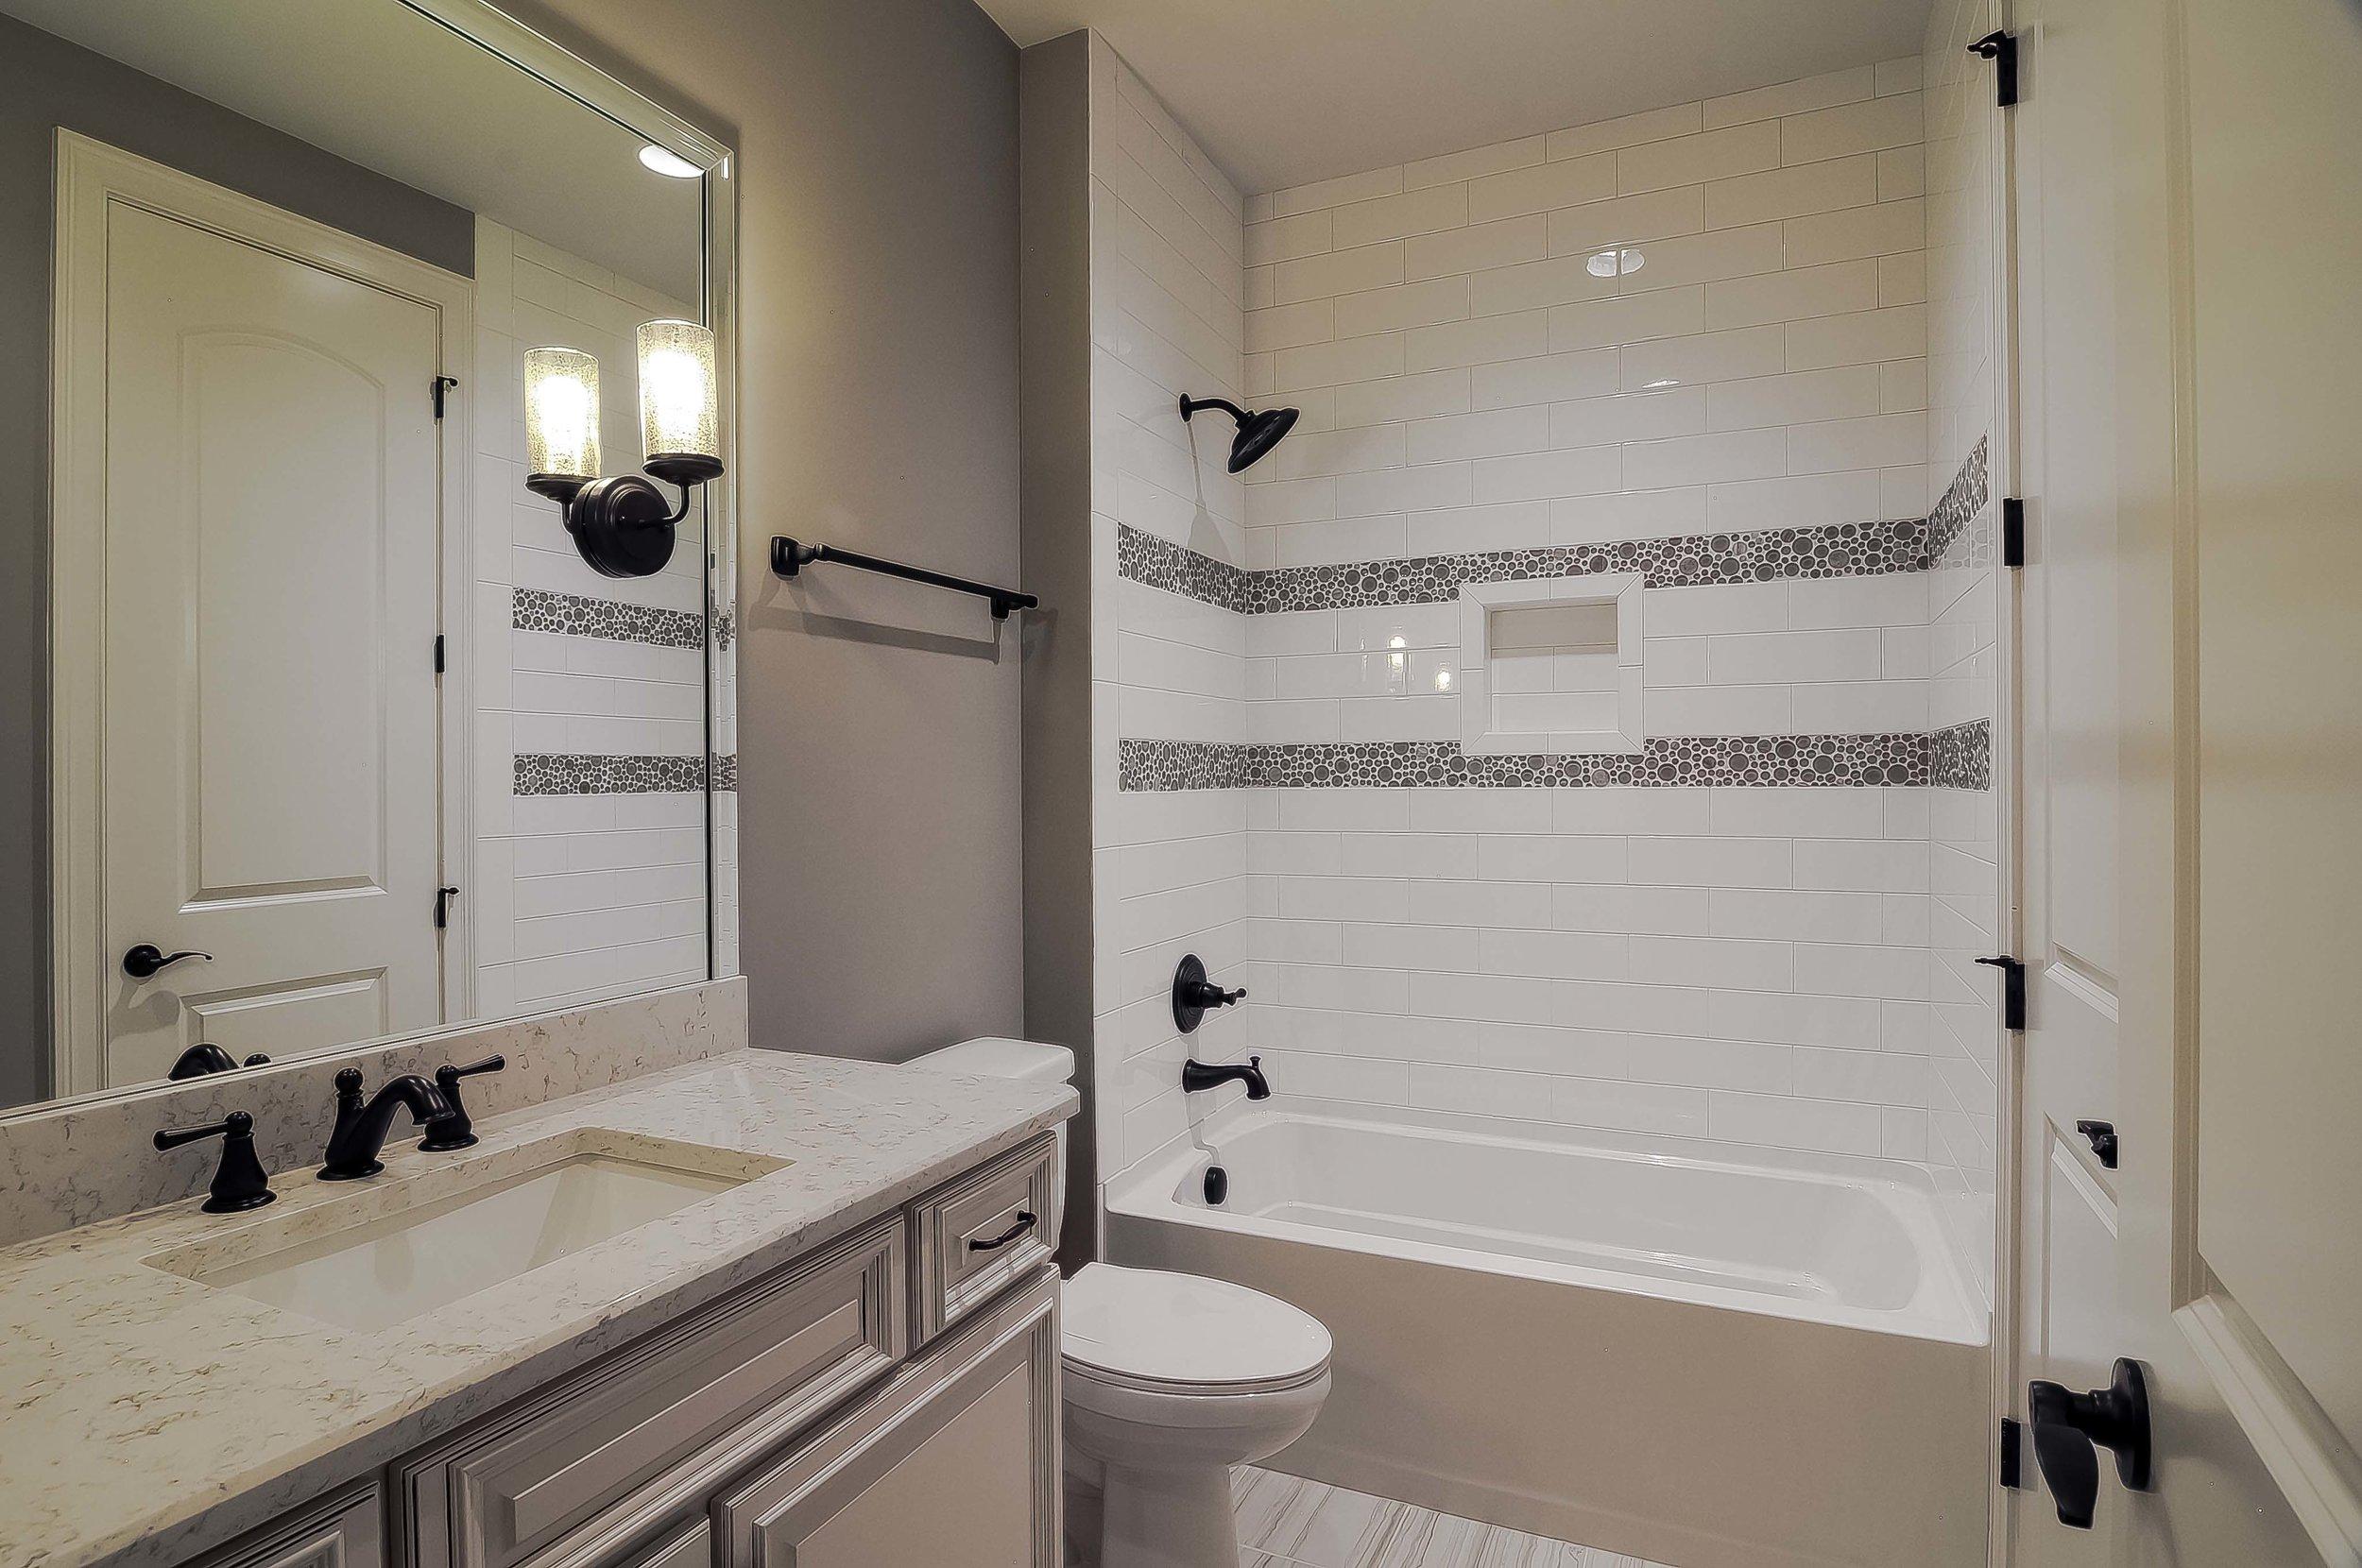 House-Plans-Online-Selections-Nashville-Peggy-Newman-Finishes-Bath-Fixtures-Tile.jpg